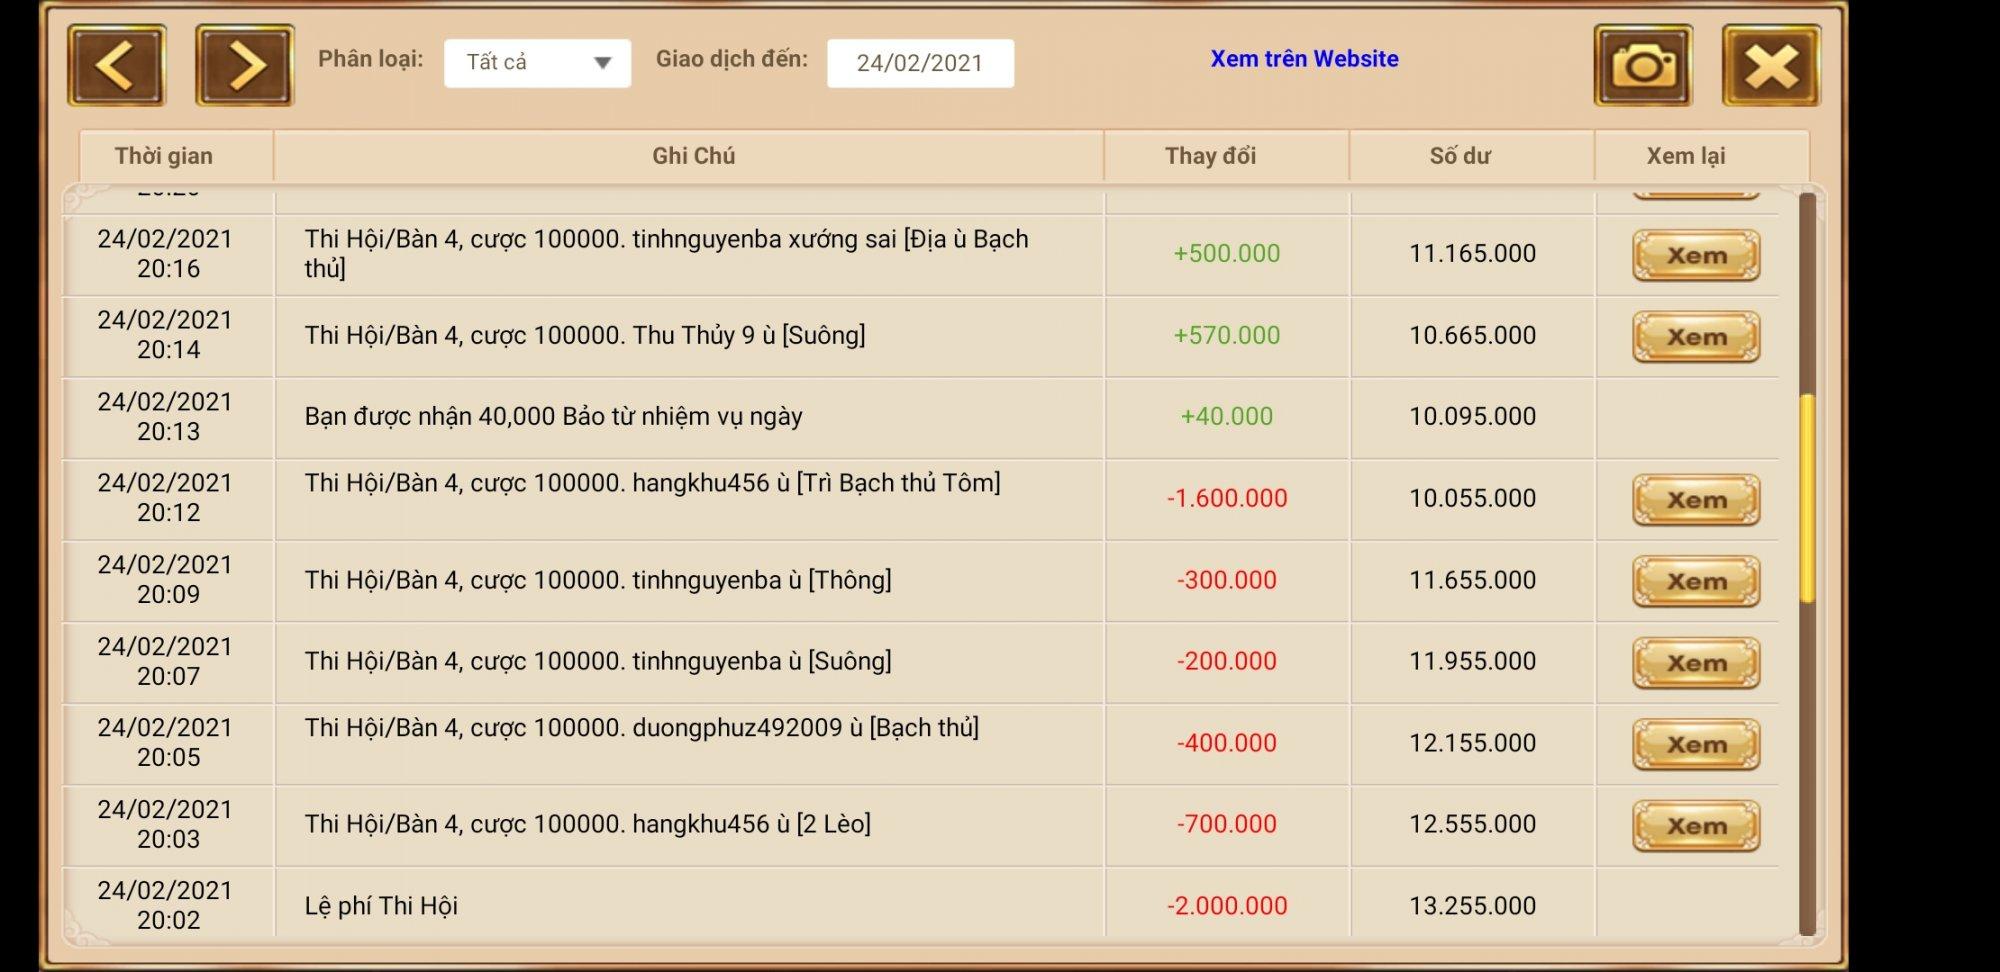 Screenshot_20210224-230349_Chn Sn nh.